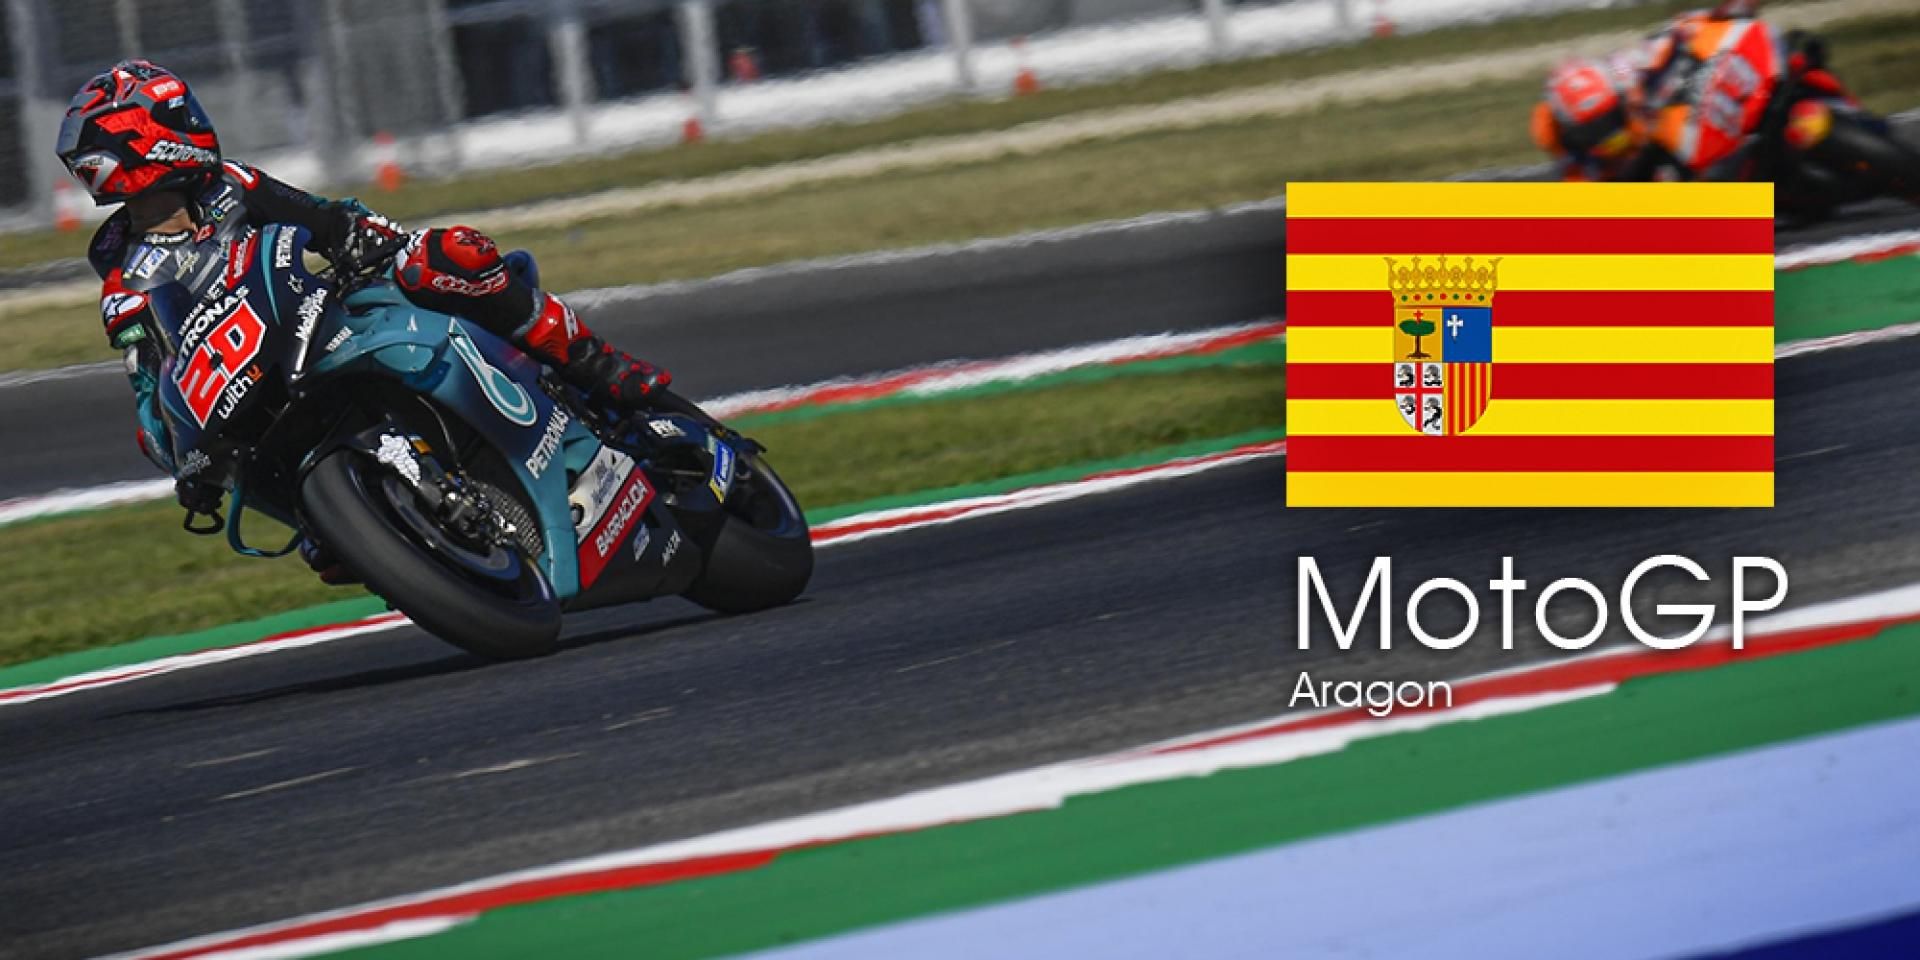 MotoGP 2019 亞拉岡站 轉播時間